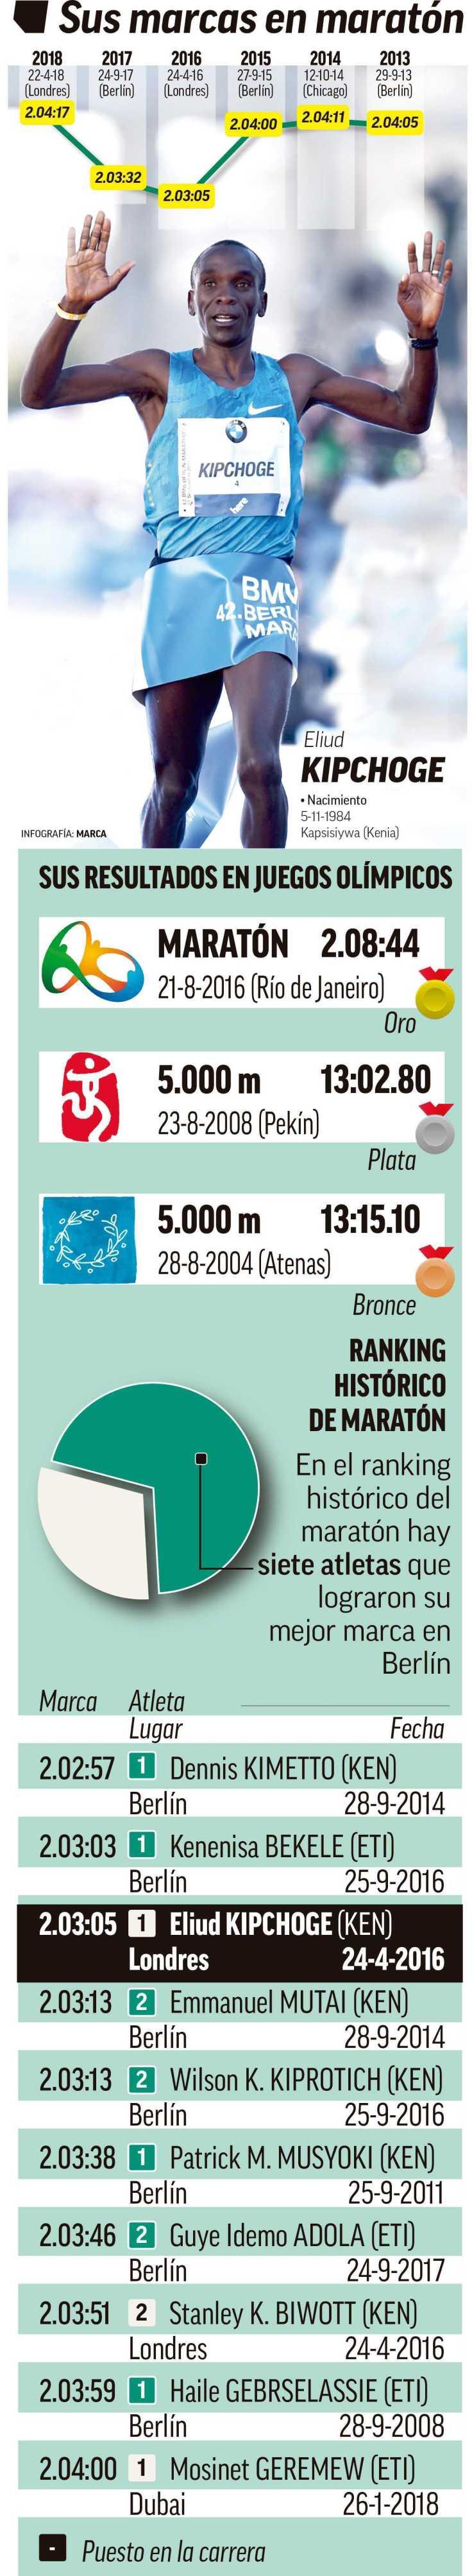 Progresion del crono de Kipchogue en maraton.